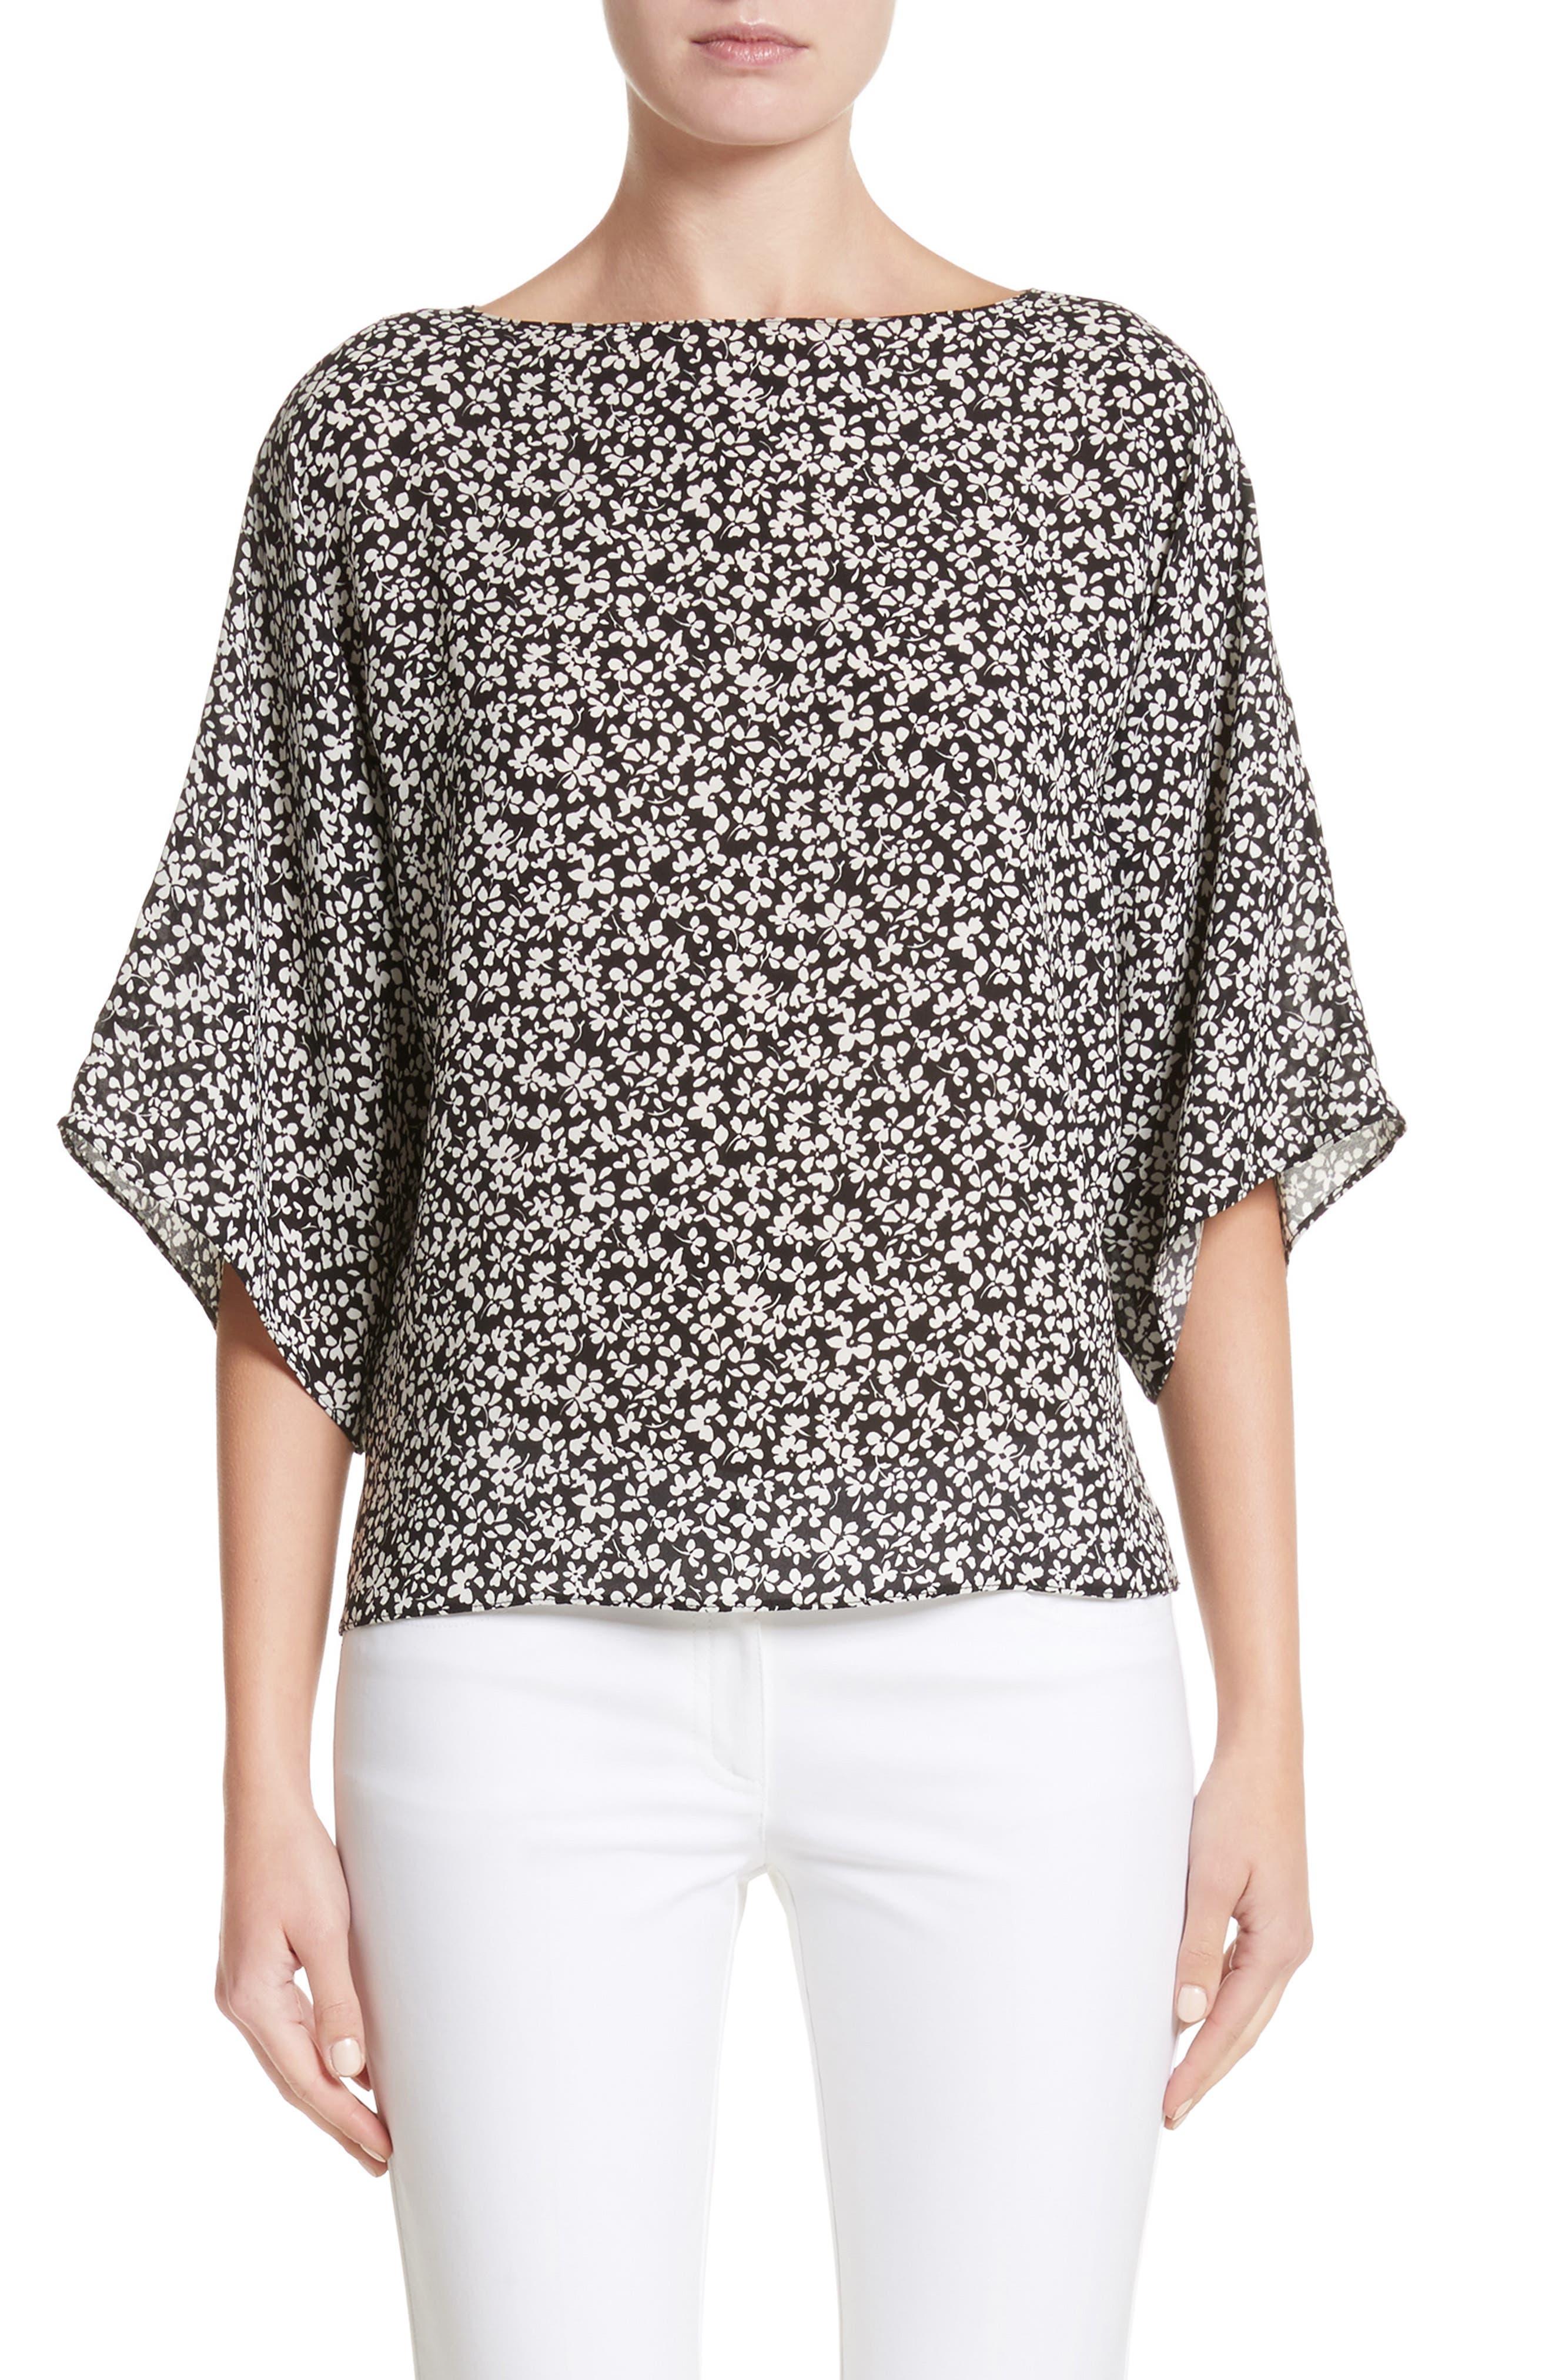 Floral Silk Blouse,                             Main thumbnail 1, color,                             Black/White